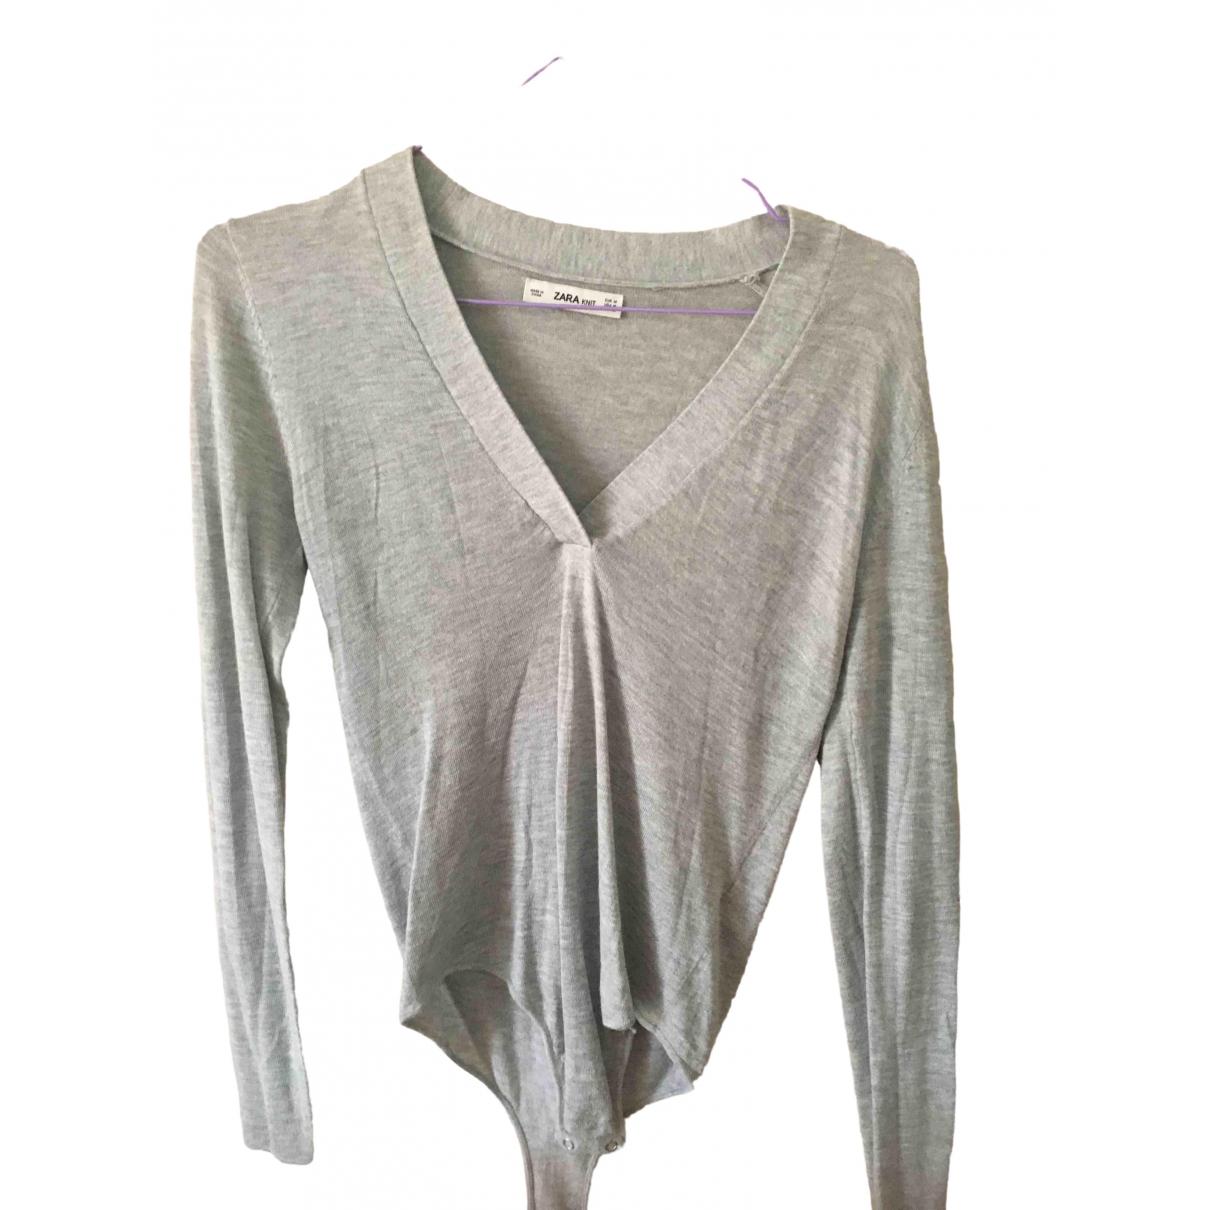 Zara \N Grey  top for Women S International